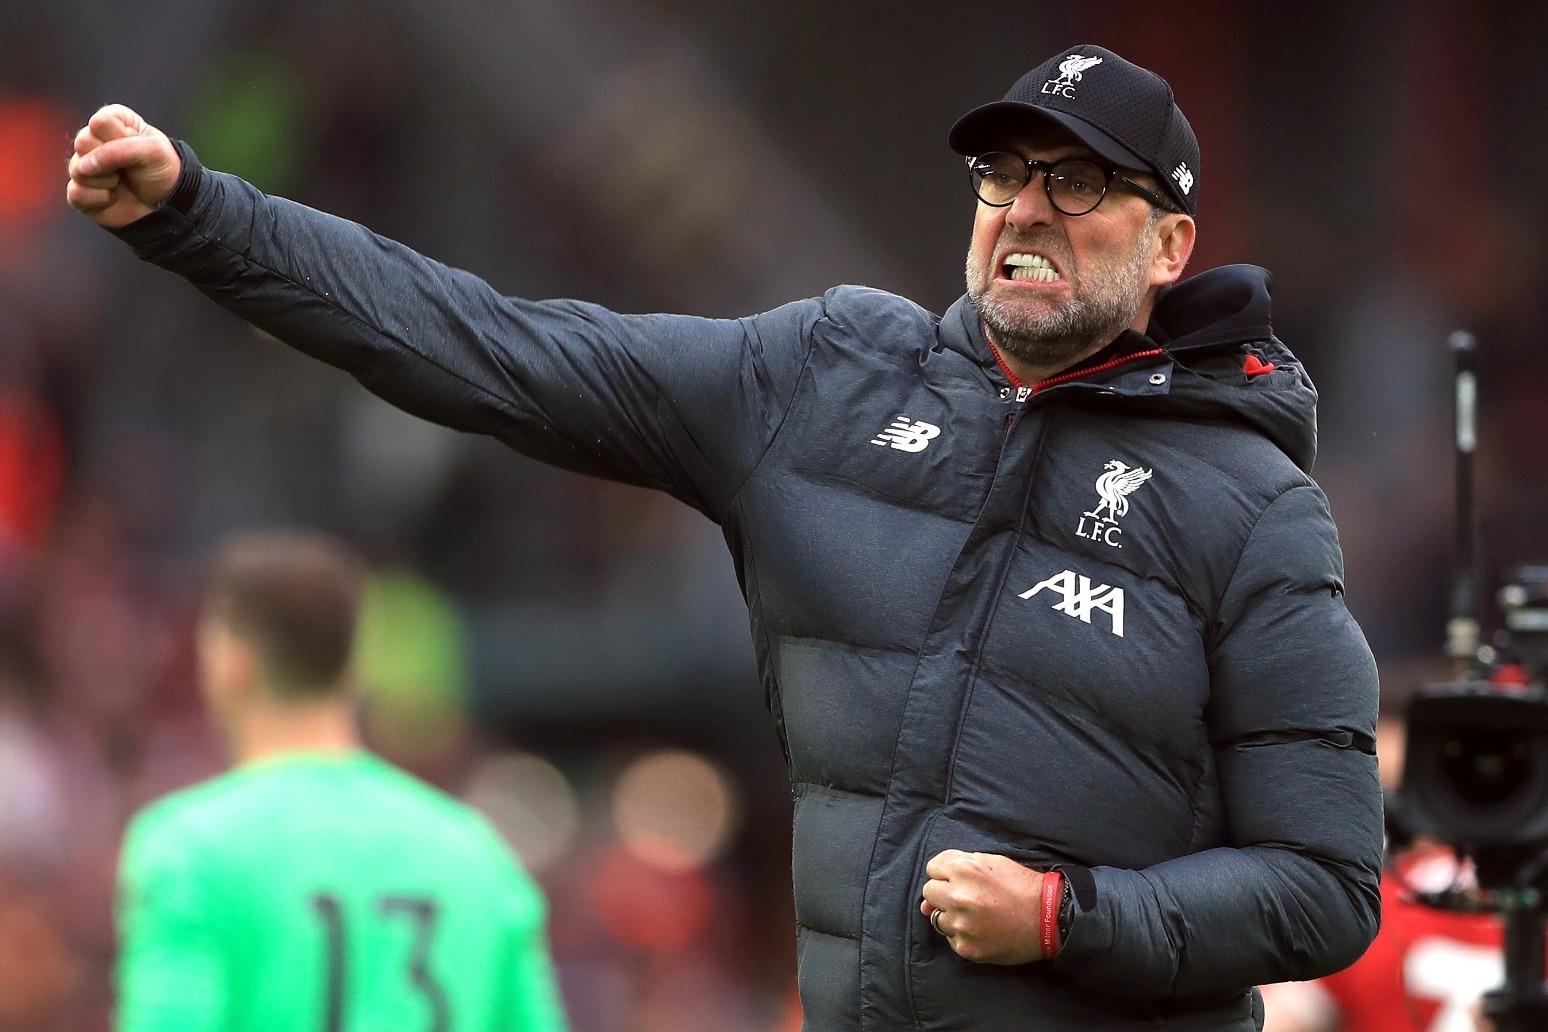 Premier League to return on June 17th